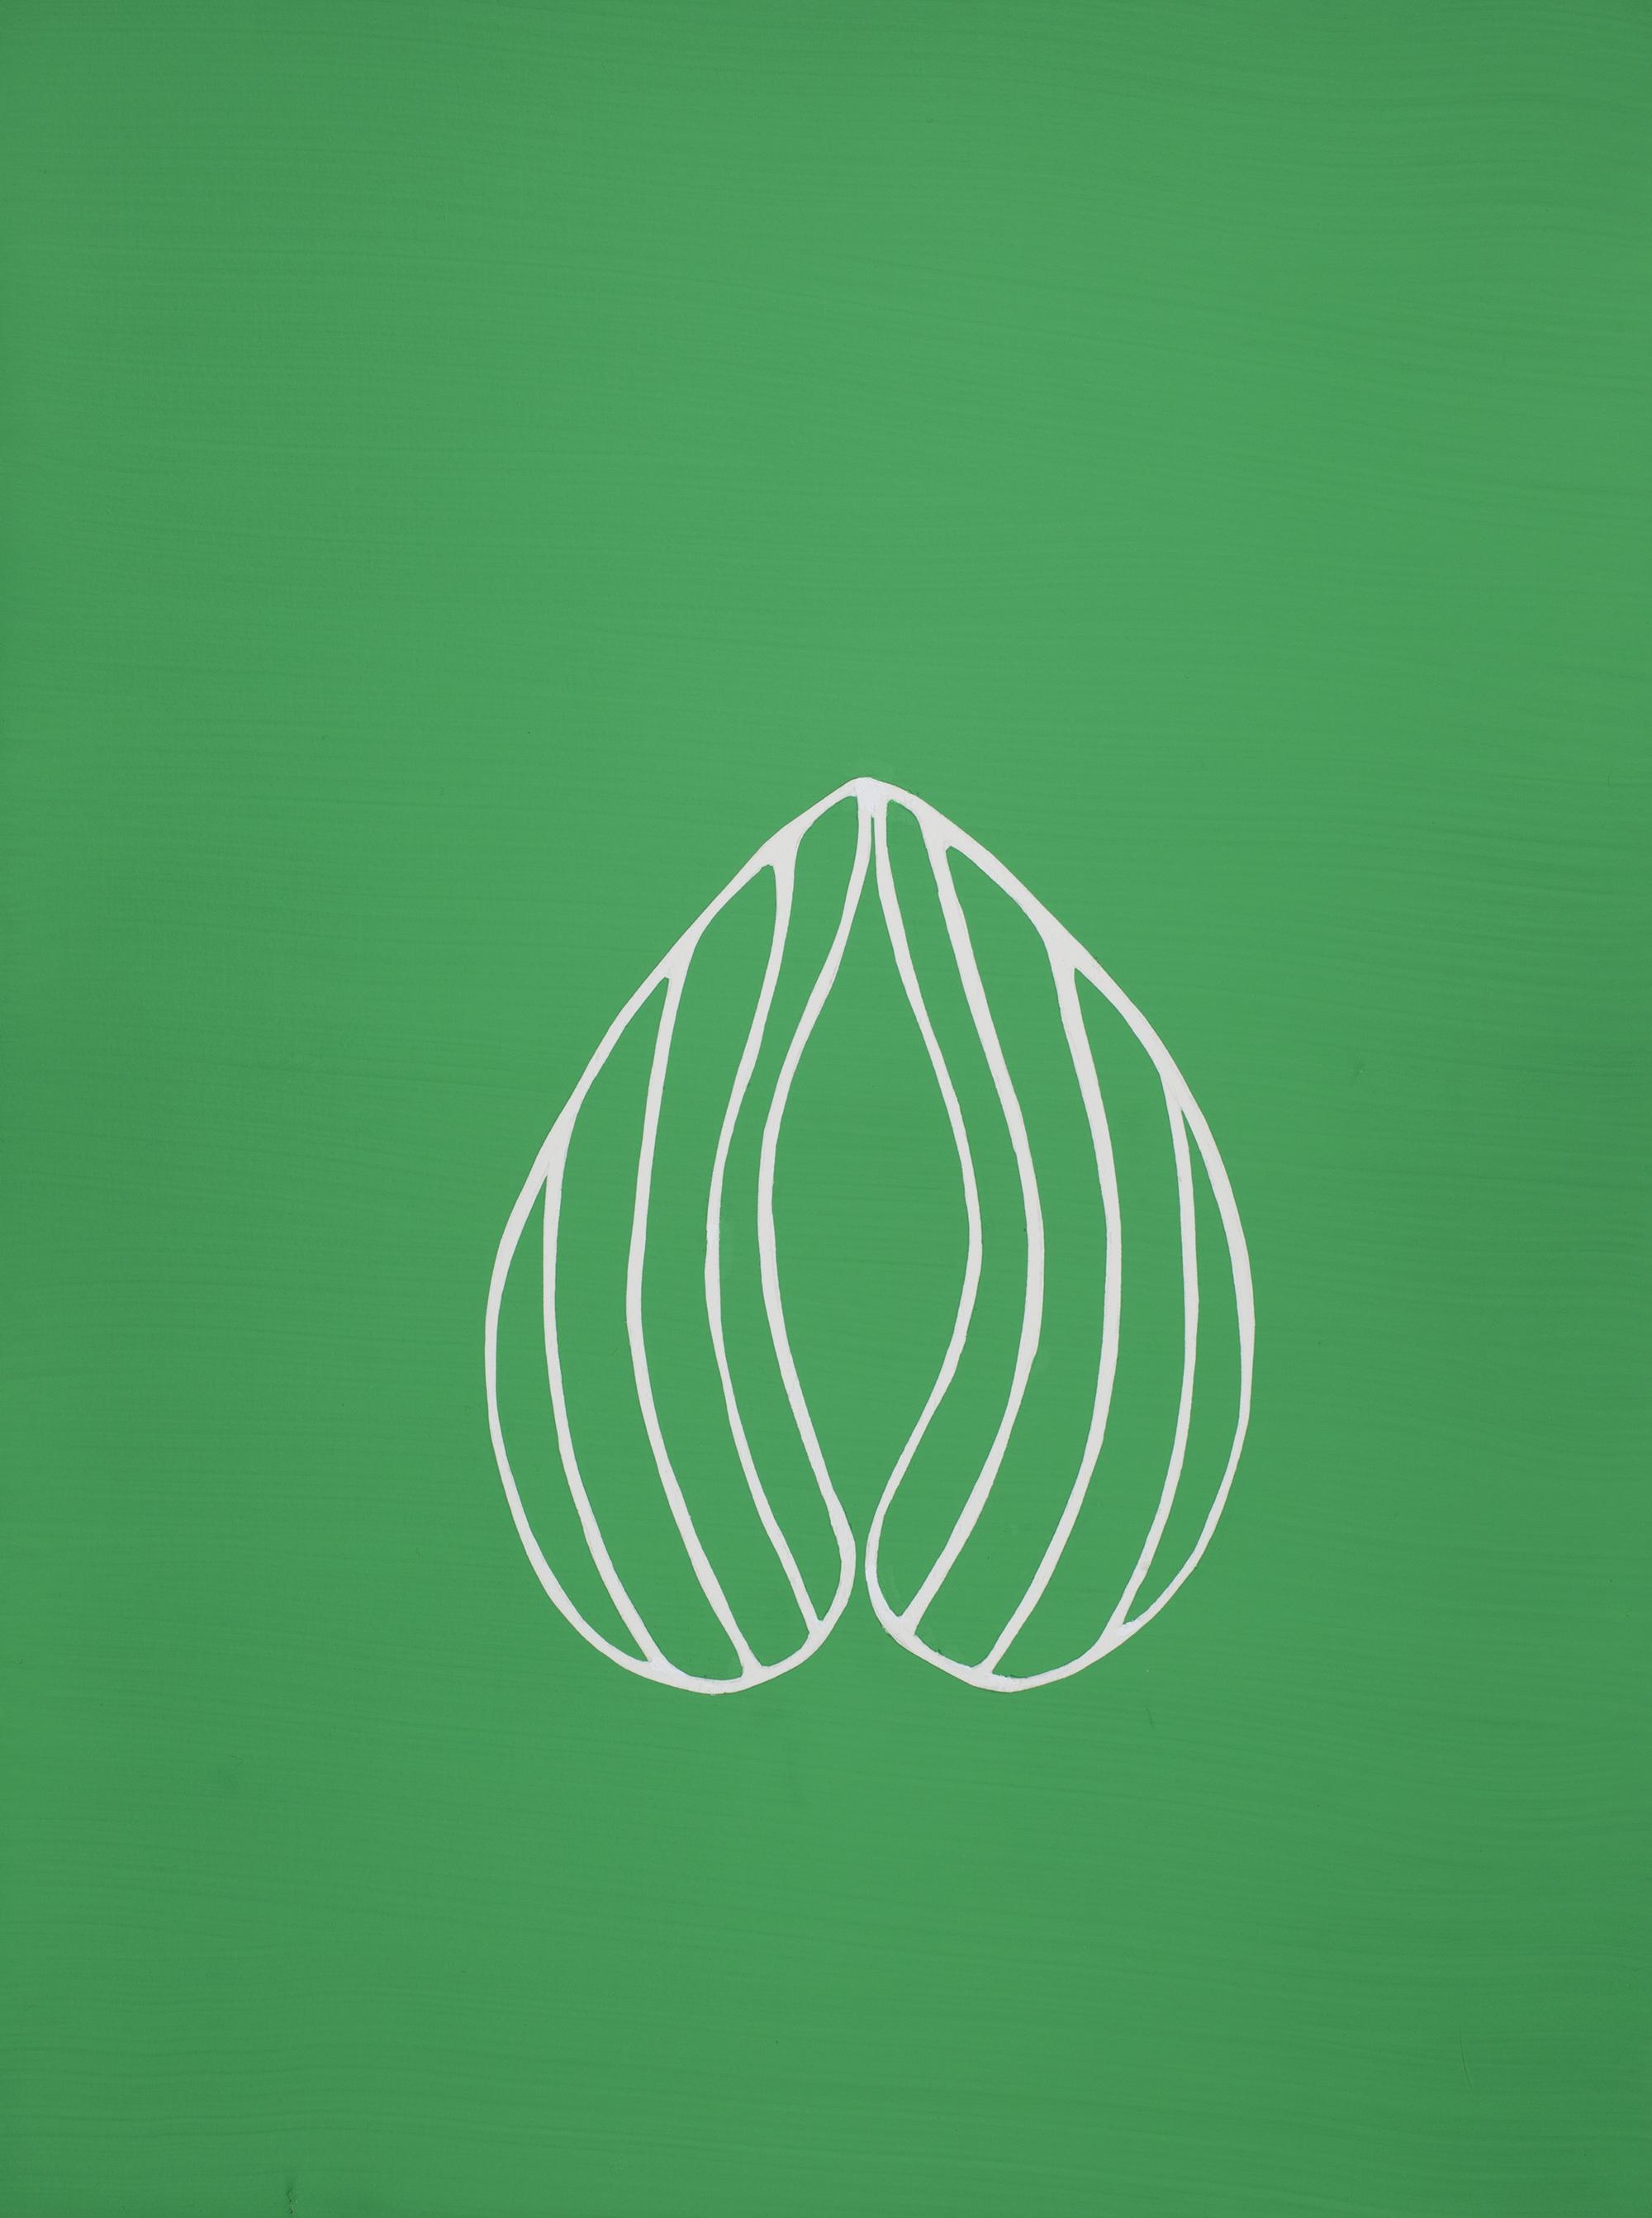 Untitled, 2015, gouache on paper, 28.6 x 38.4 cm